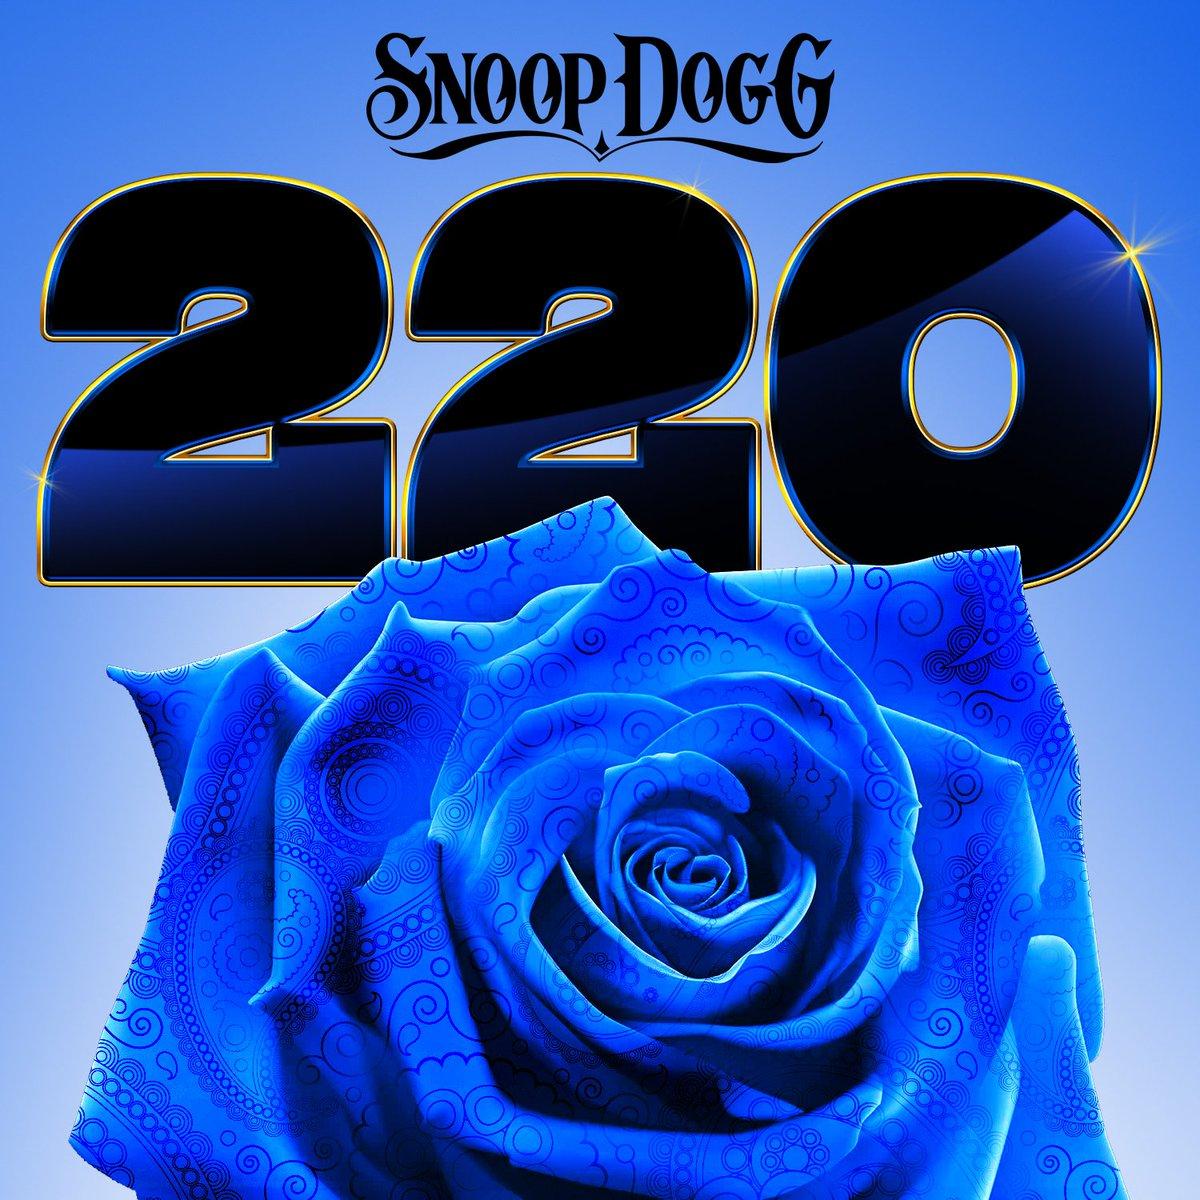 Snoop Dogg top tweets